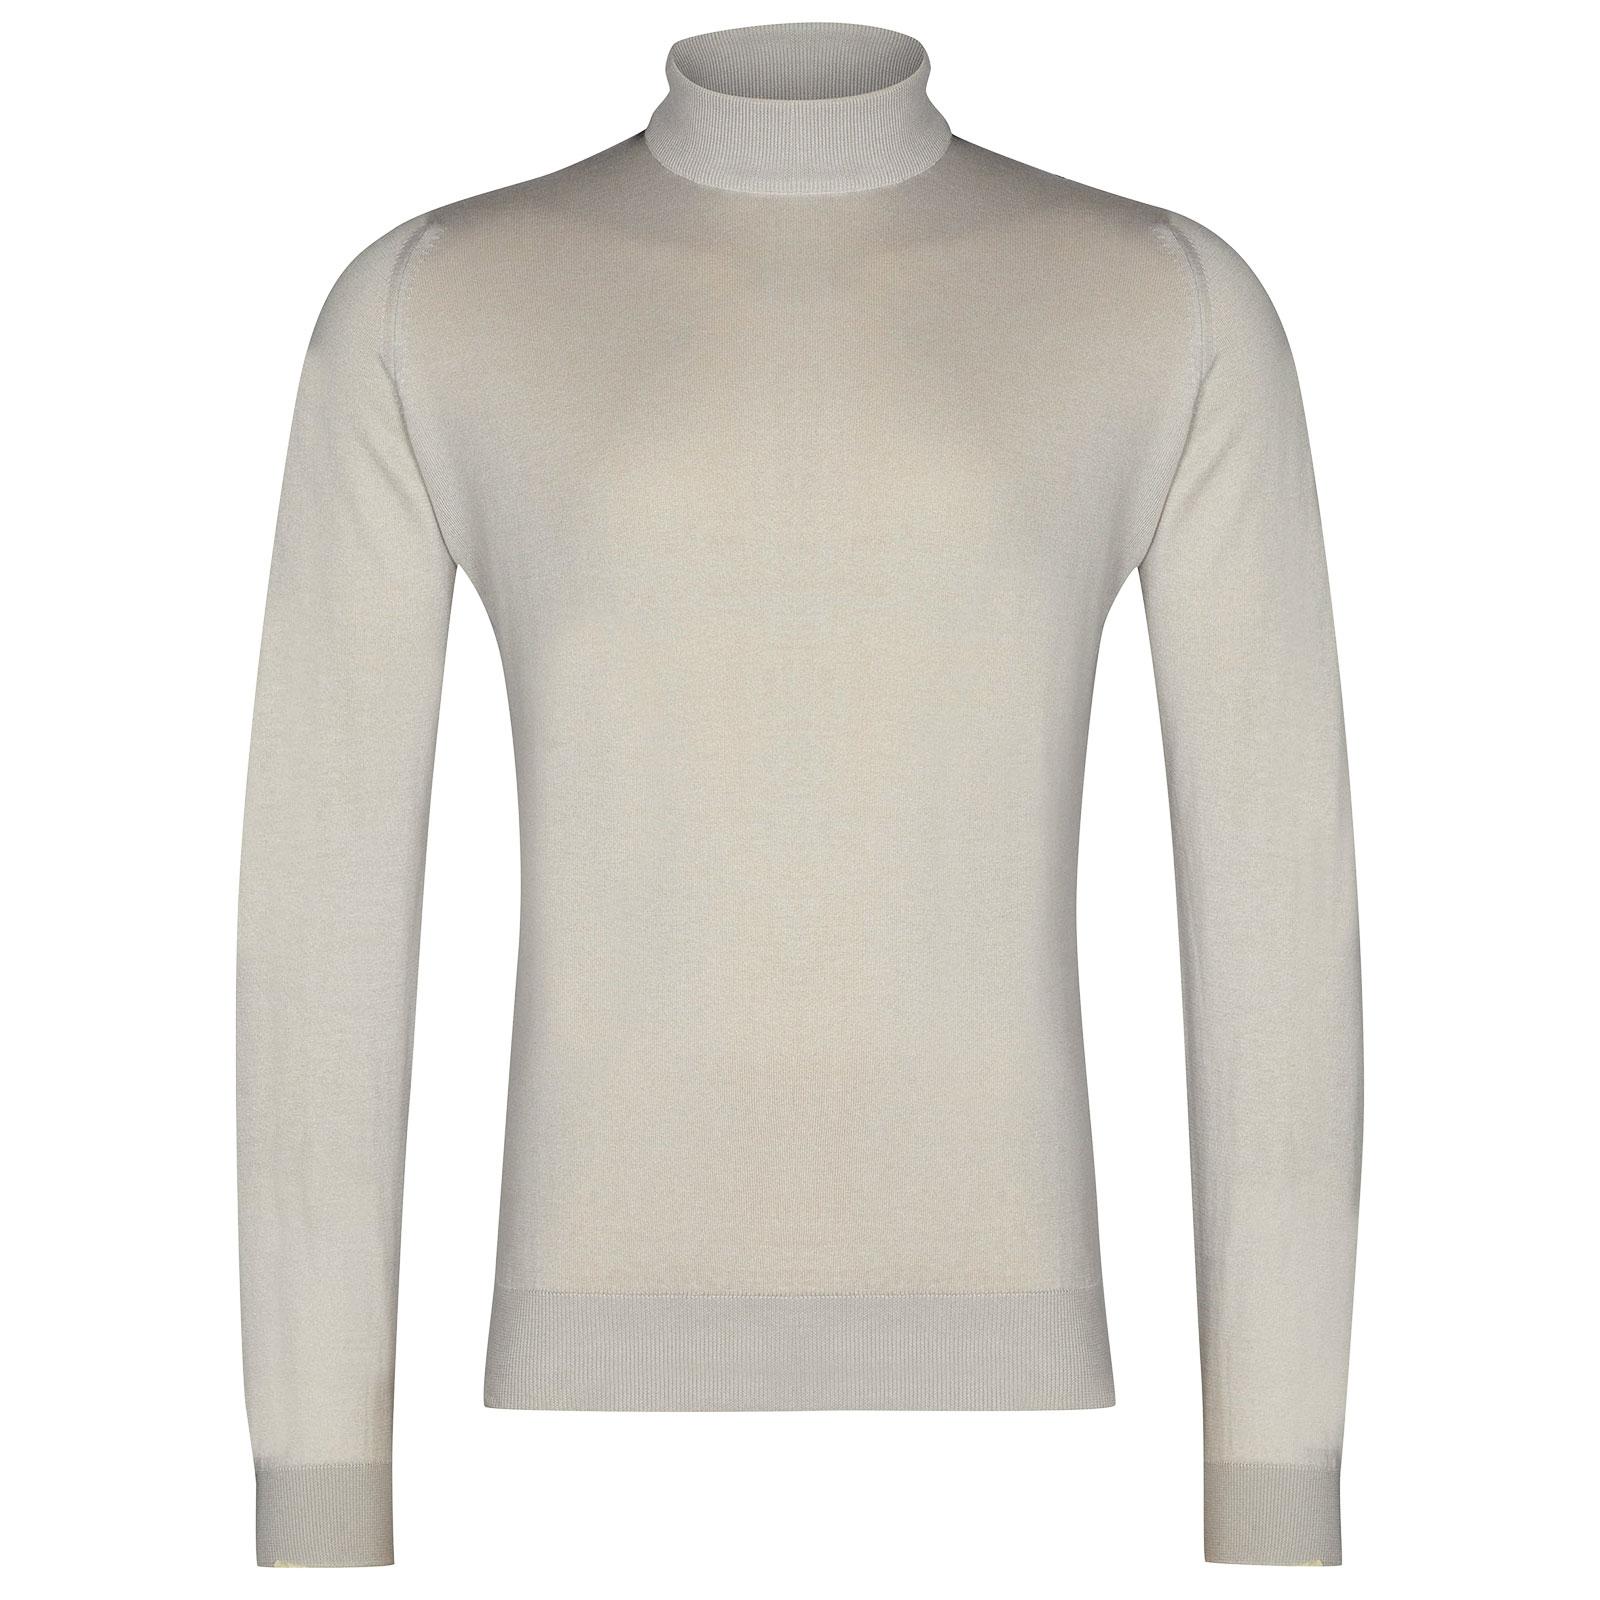 John Smedley Bradgate Sea Island Cotton Pullover in Brunel Beige-L